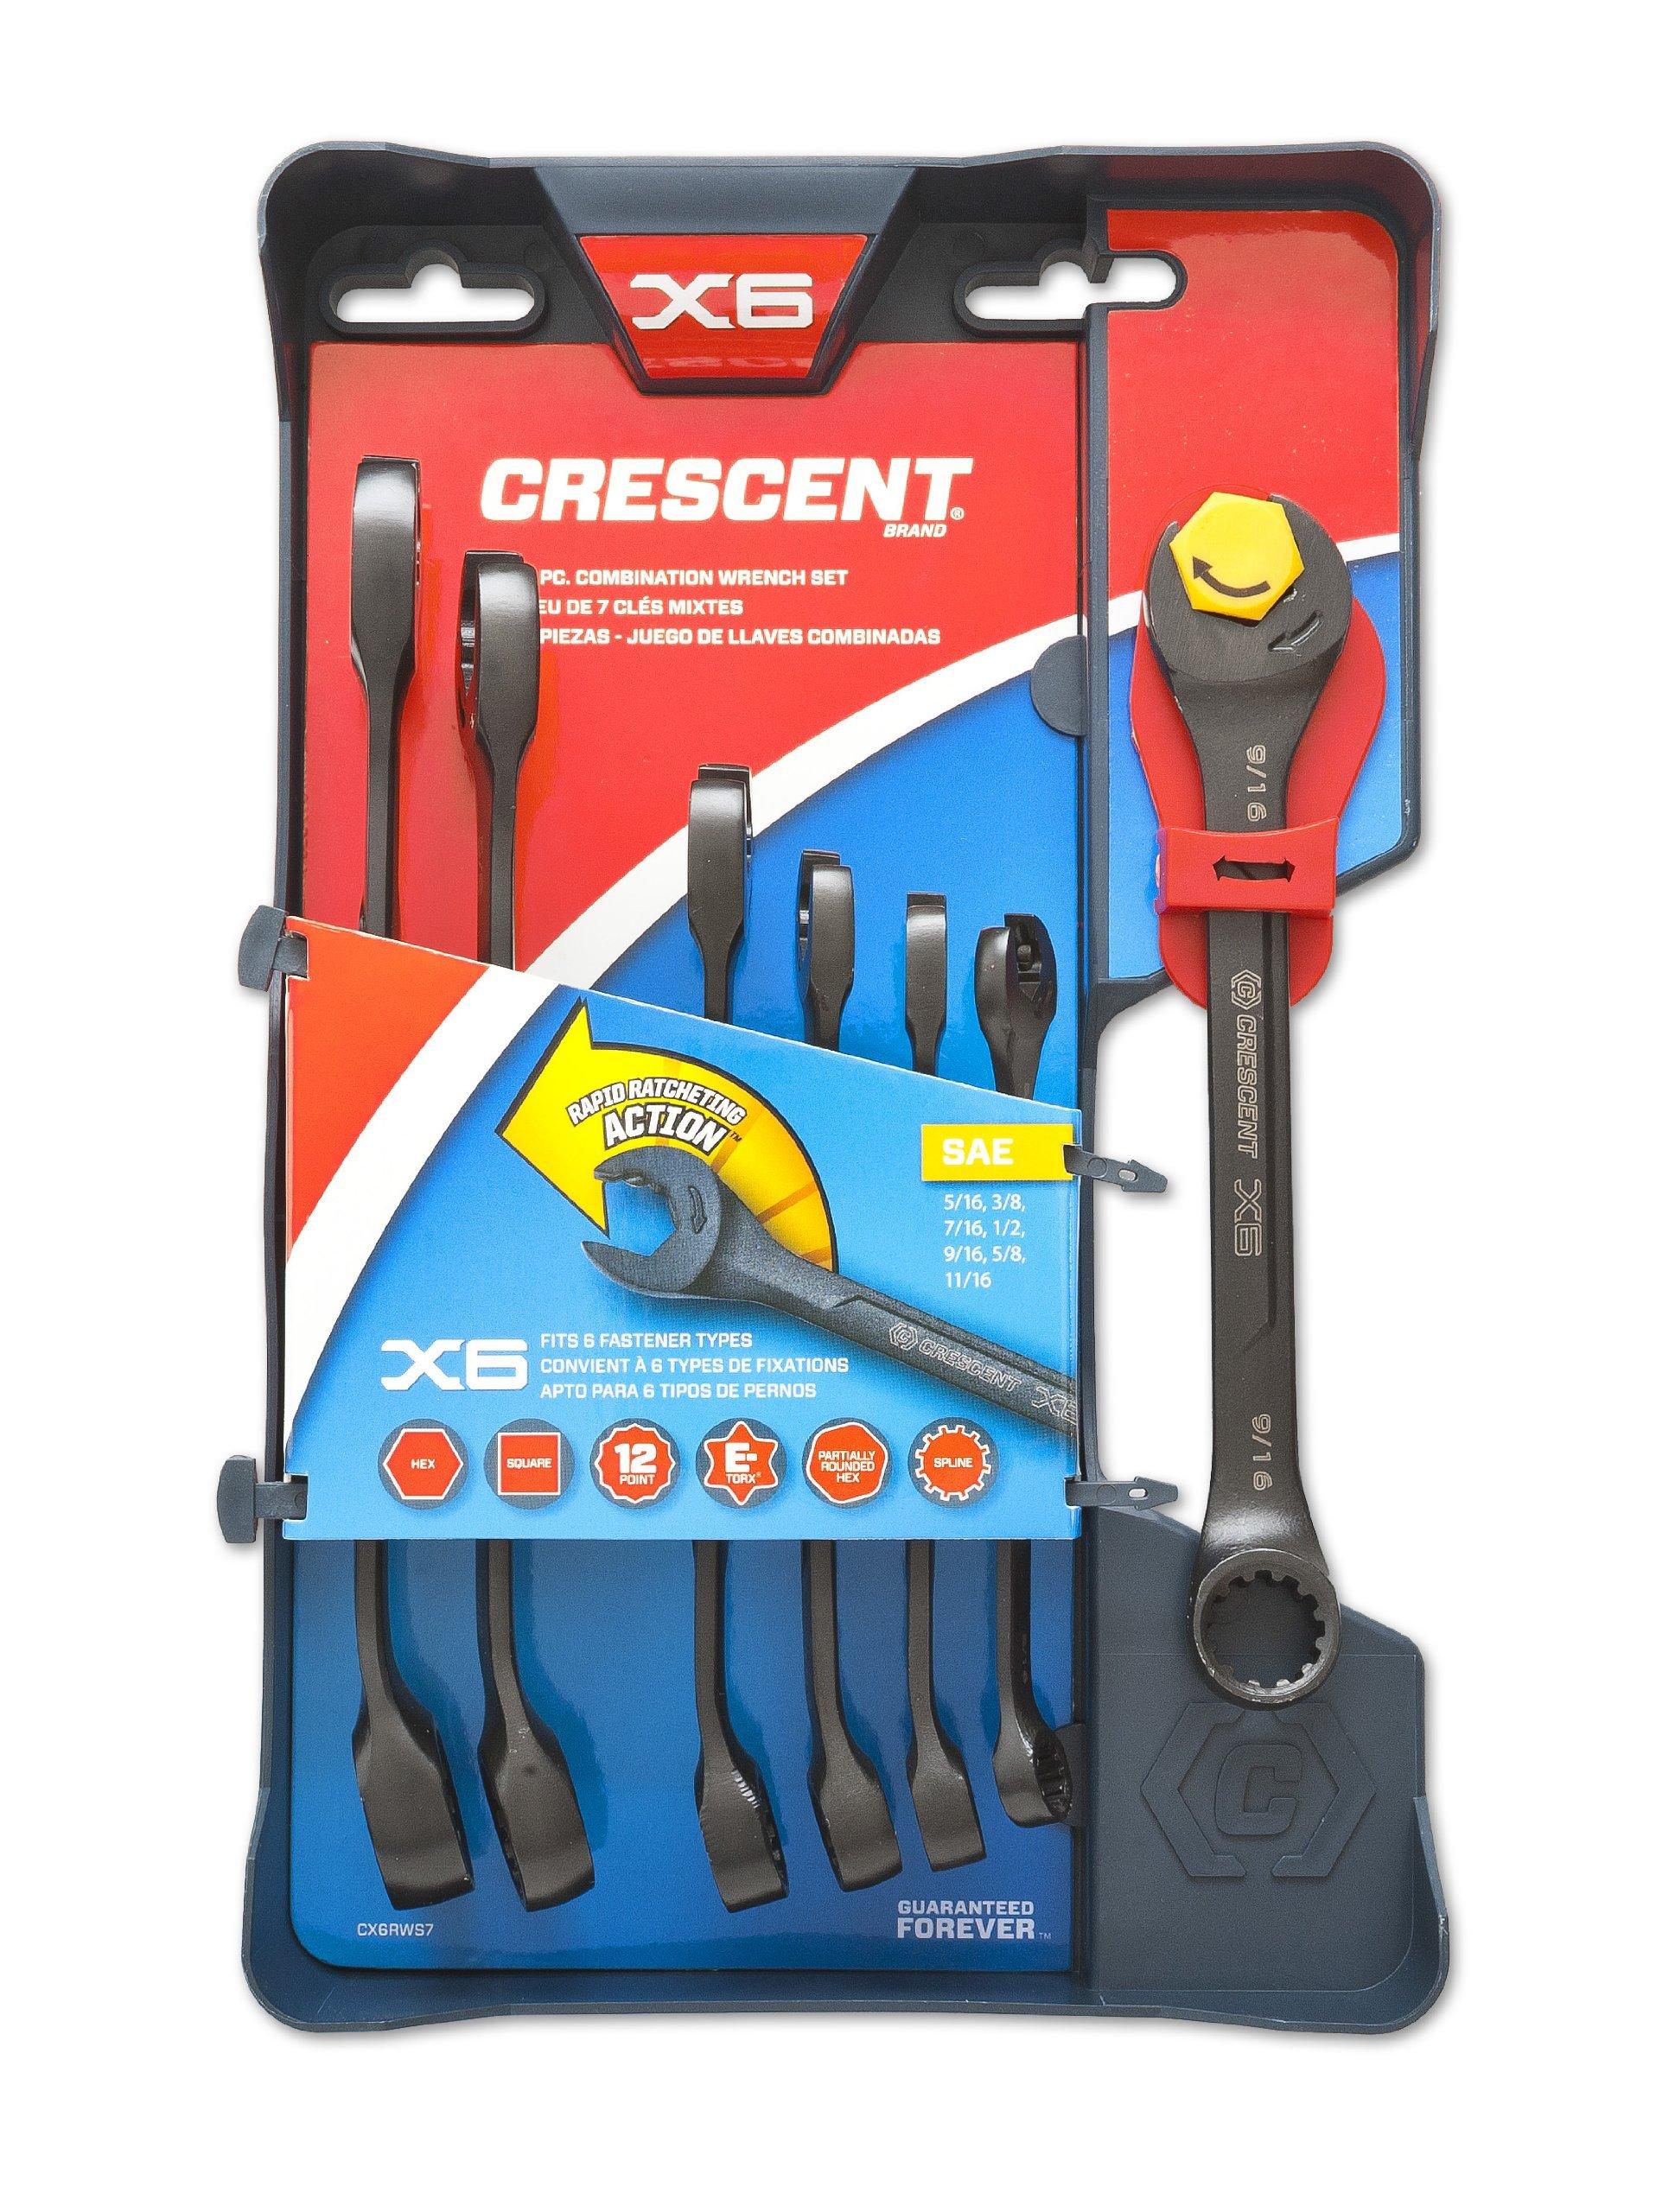 Crescent 7 Pc. X6 Black Oxide Spline Open End Ratcheting Combination SAE Wrench Set - CX6RWS7 by Crescent